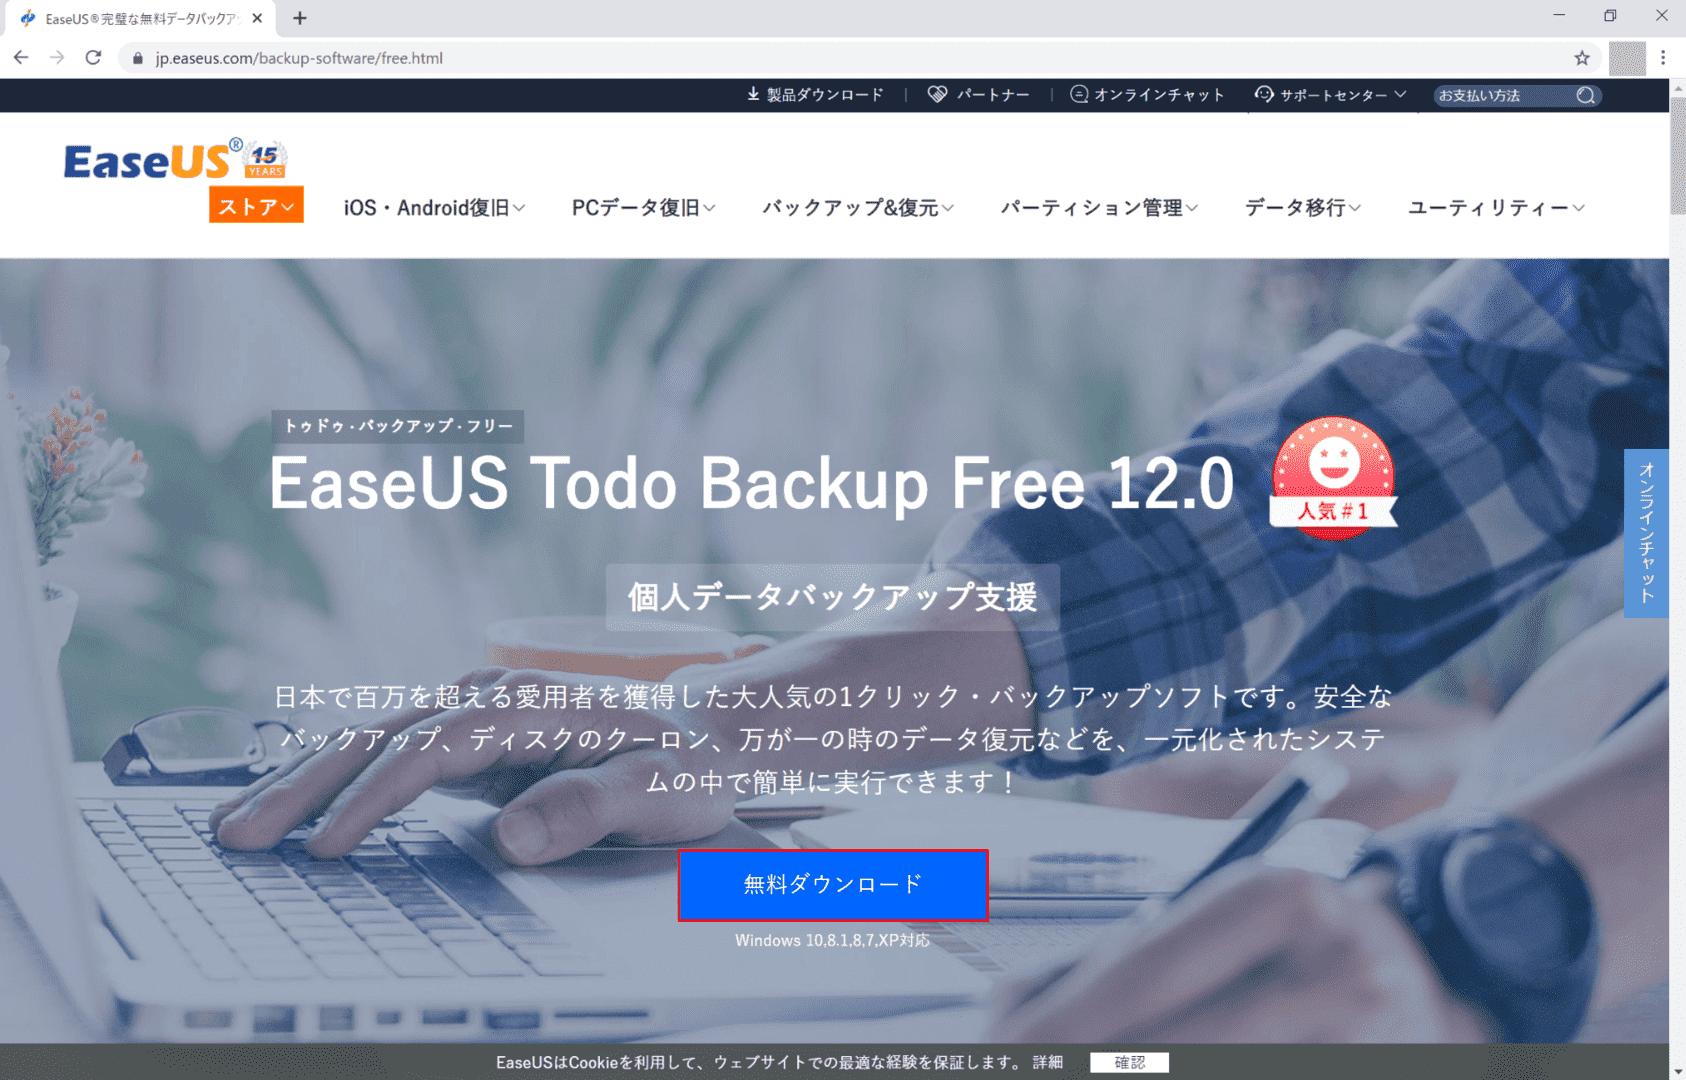 EaseUS Todo Backupの購入とダウンロード